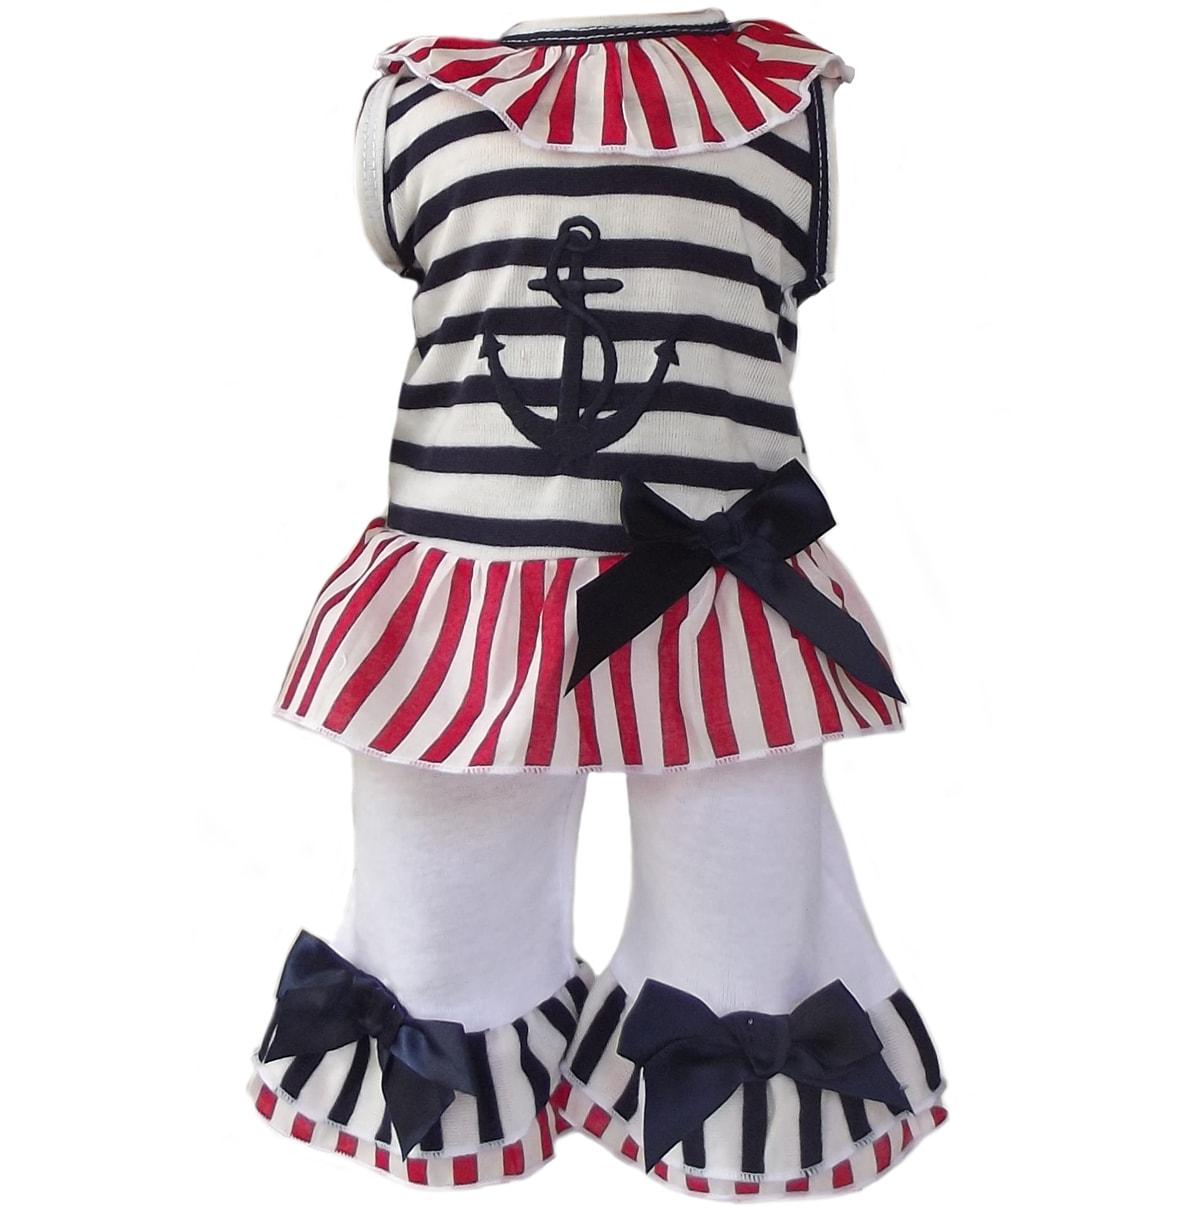 AnnLoren 'Patriotic Sailor' Two-piece Doll Outfit